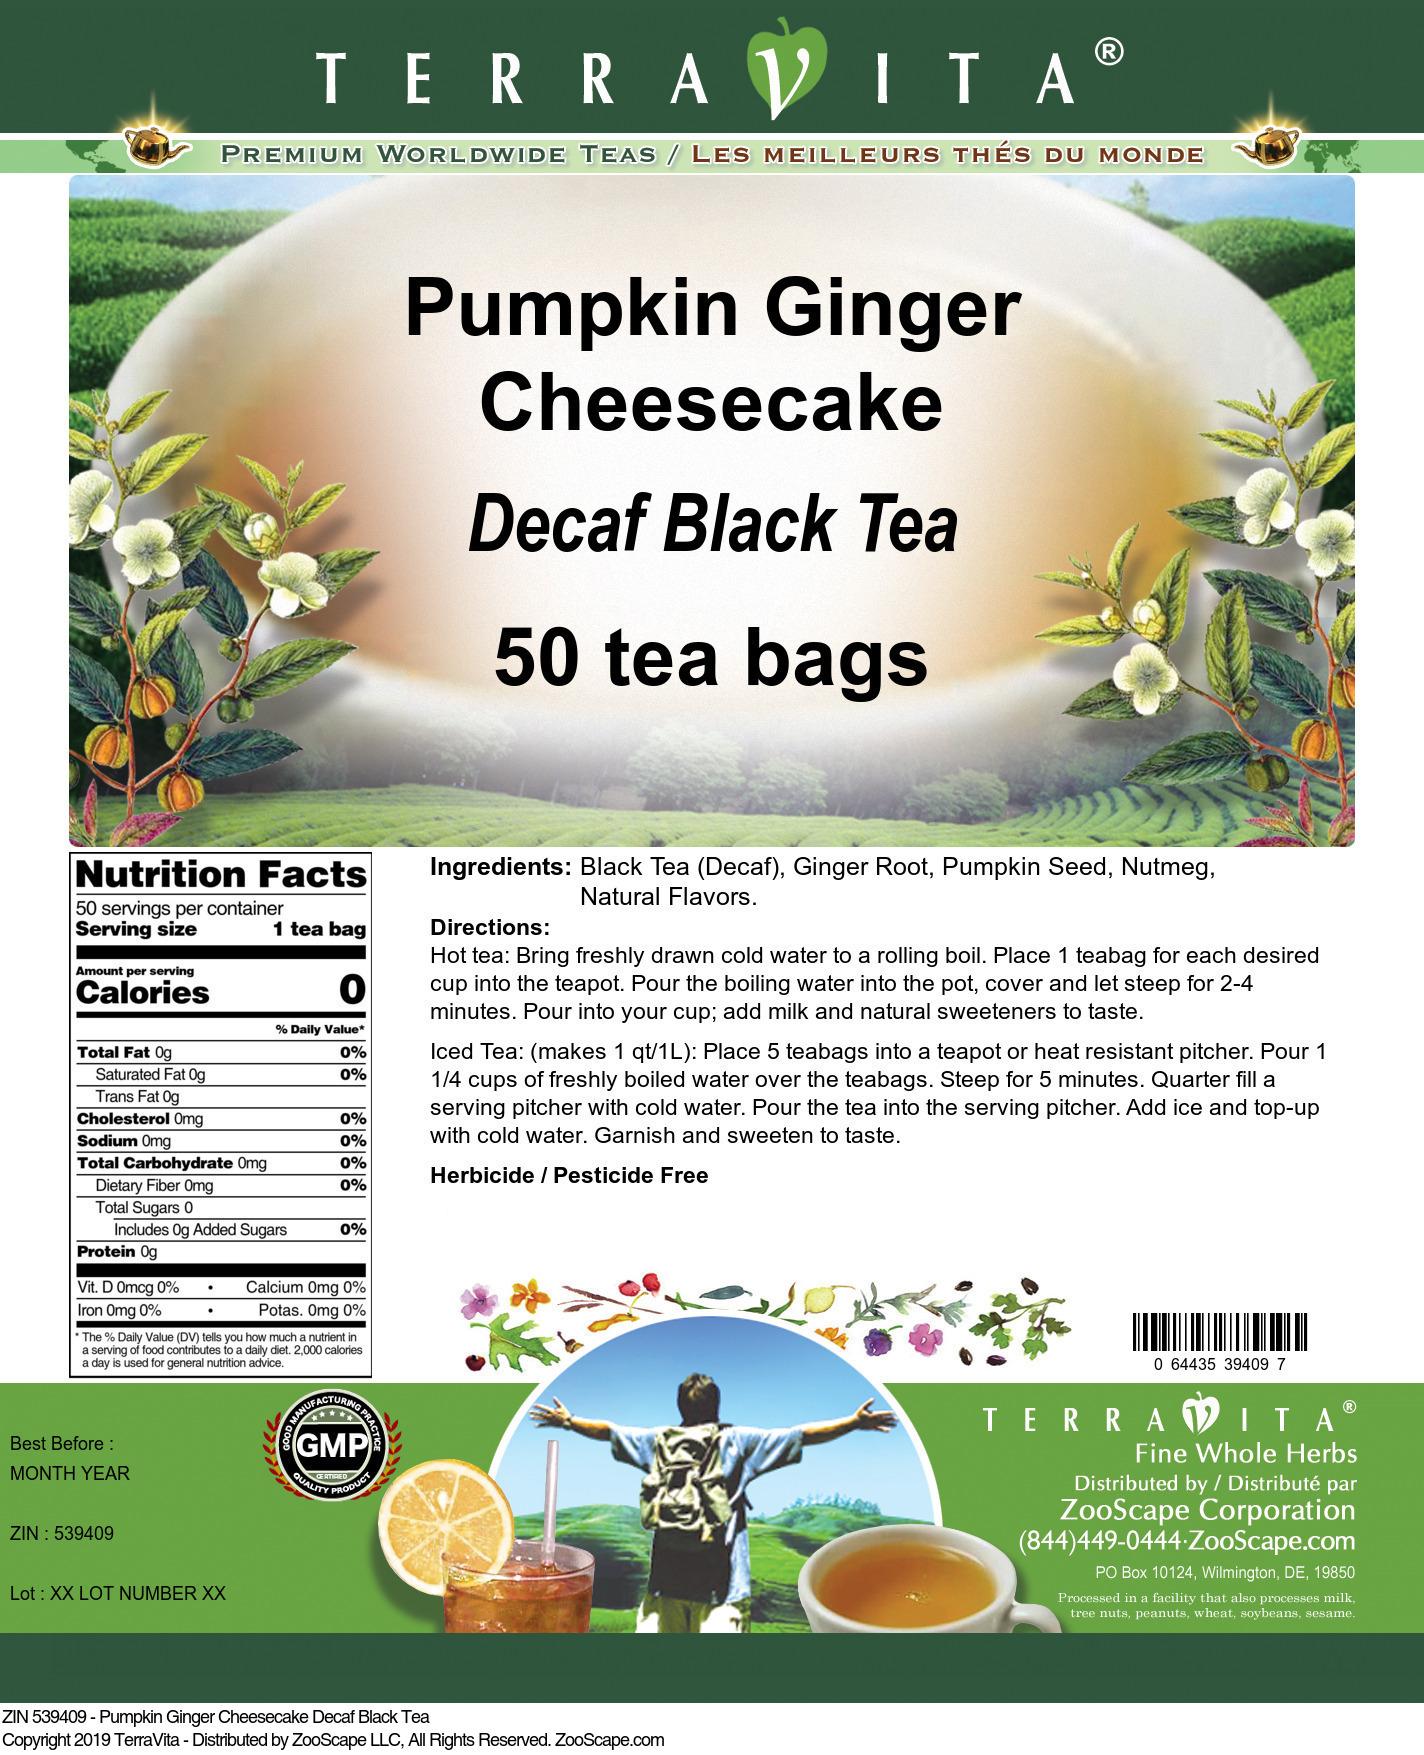 Pumpkin Ginger Cheesecake Decaf Black Tea